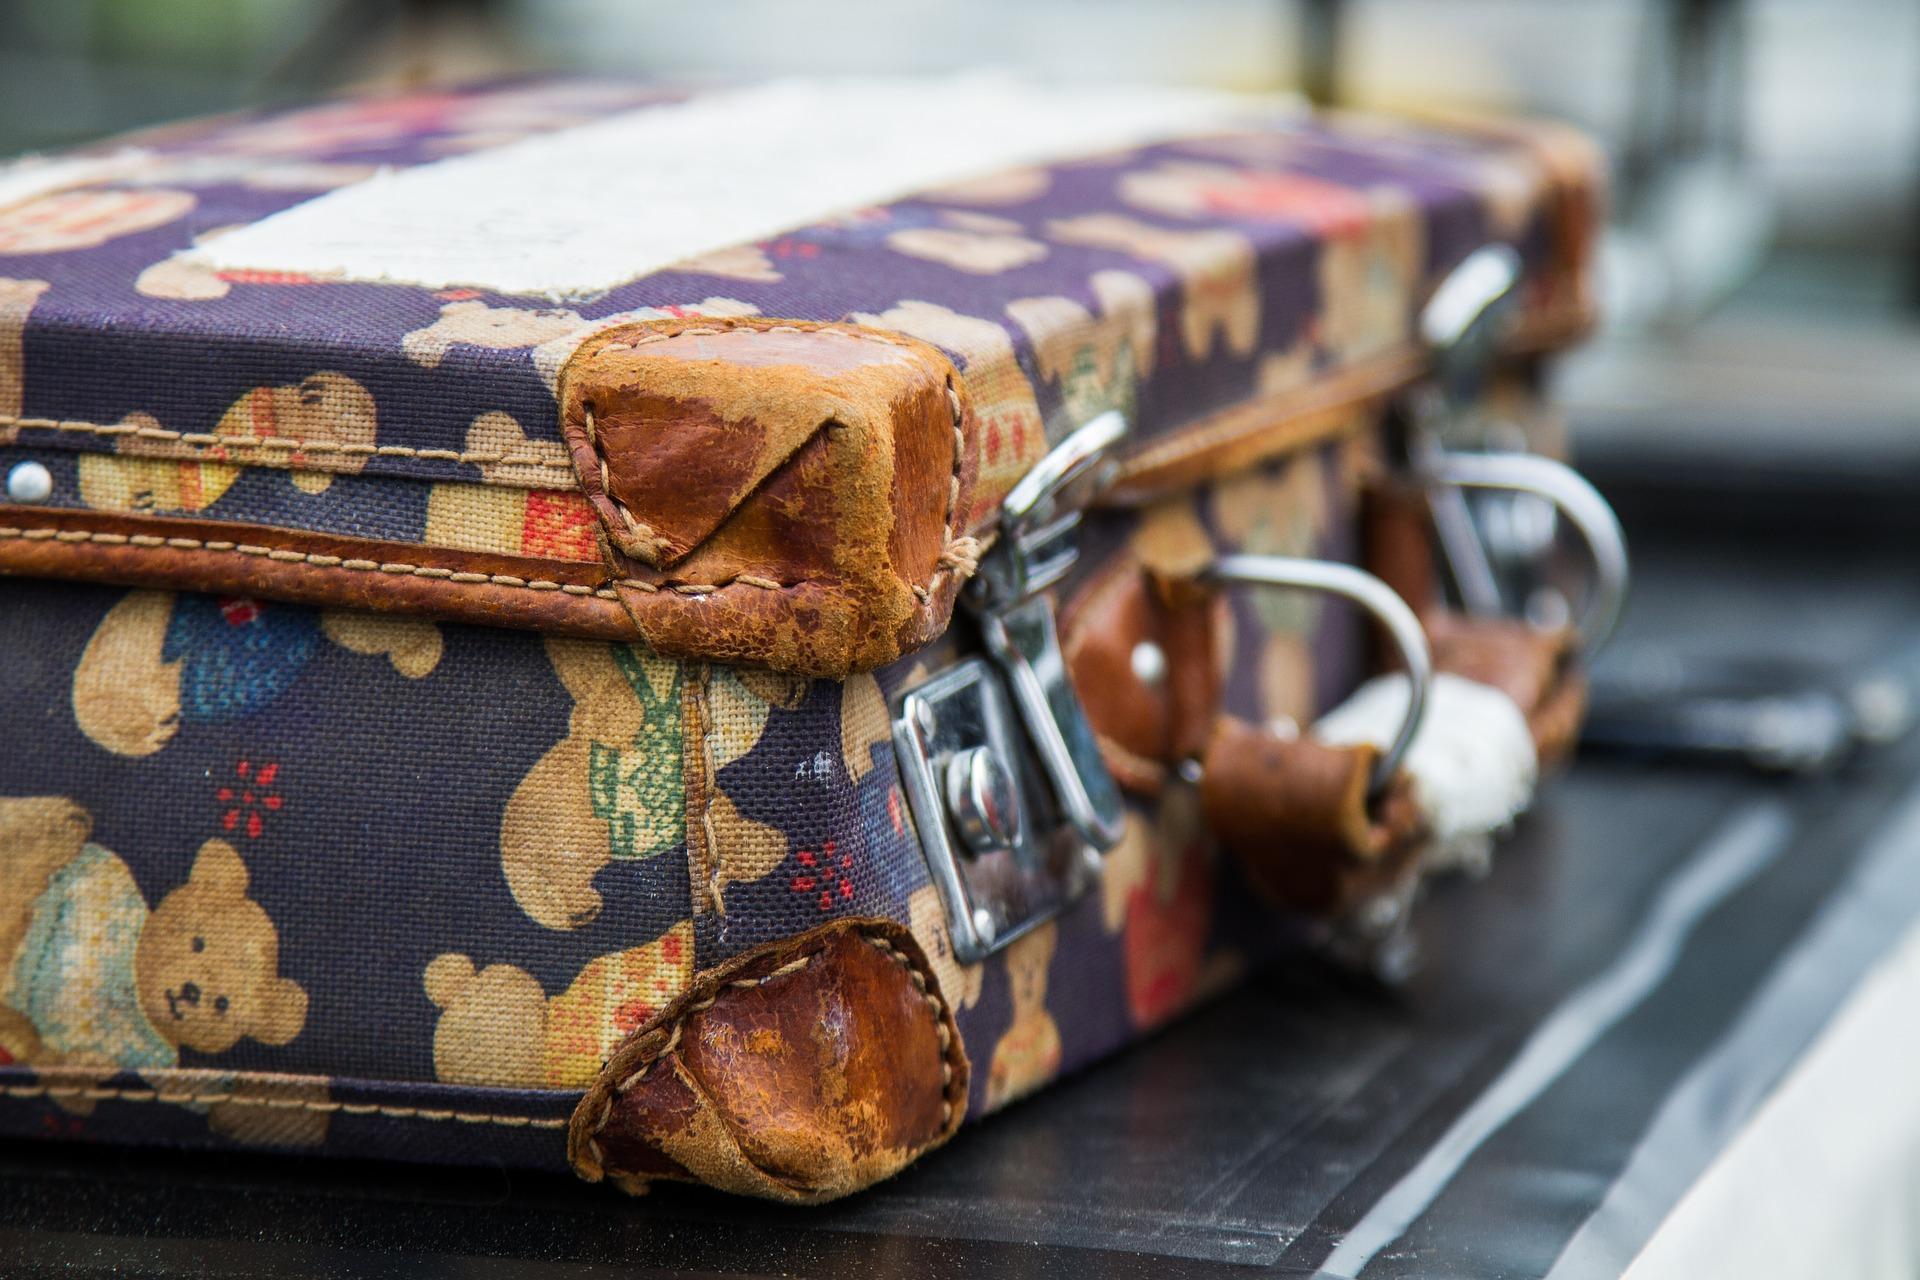 ce-pui-in-bagajul-pentru-concediu